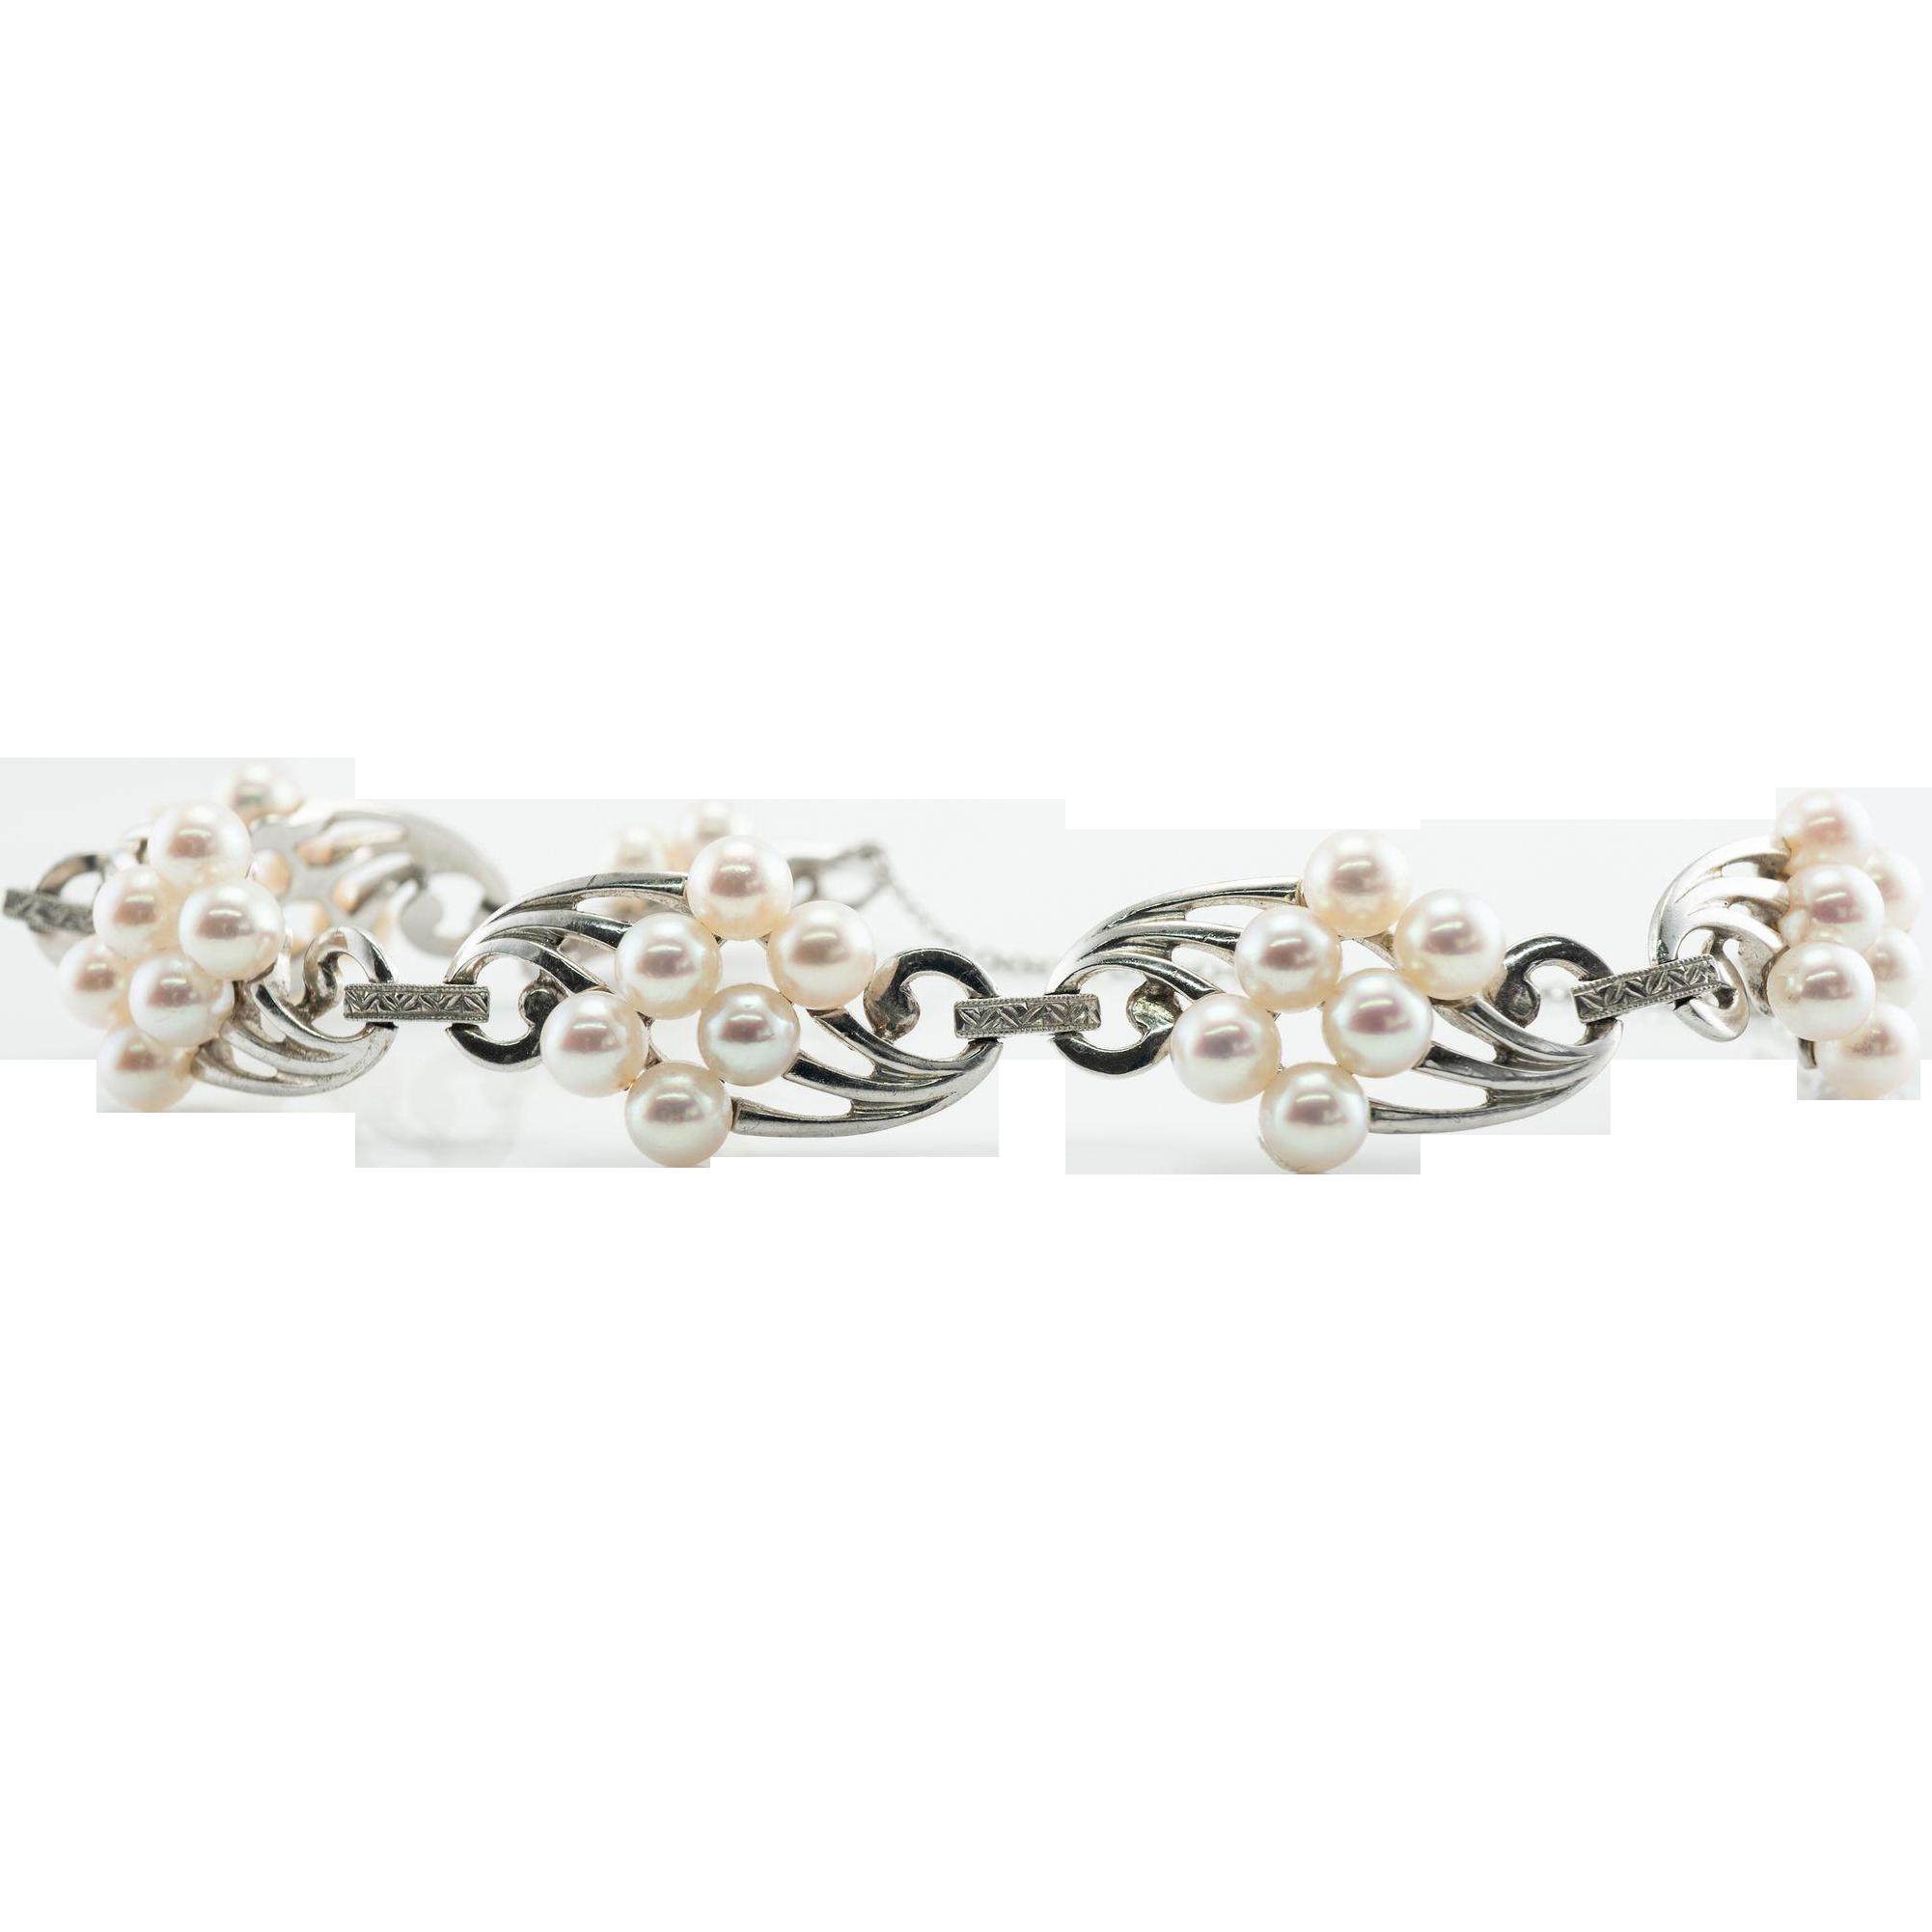 Vintage Designer Jewelry Mikimoto 14K White Gold Cultured Pearl